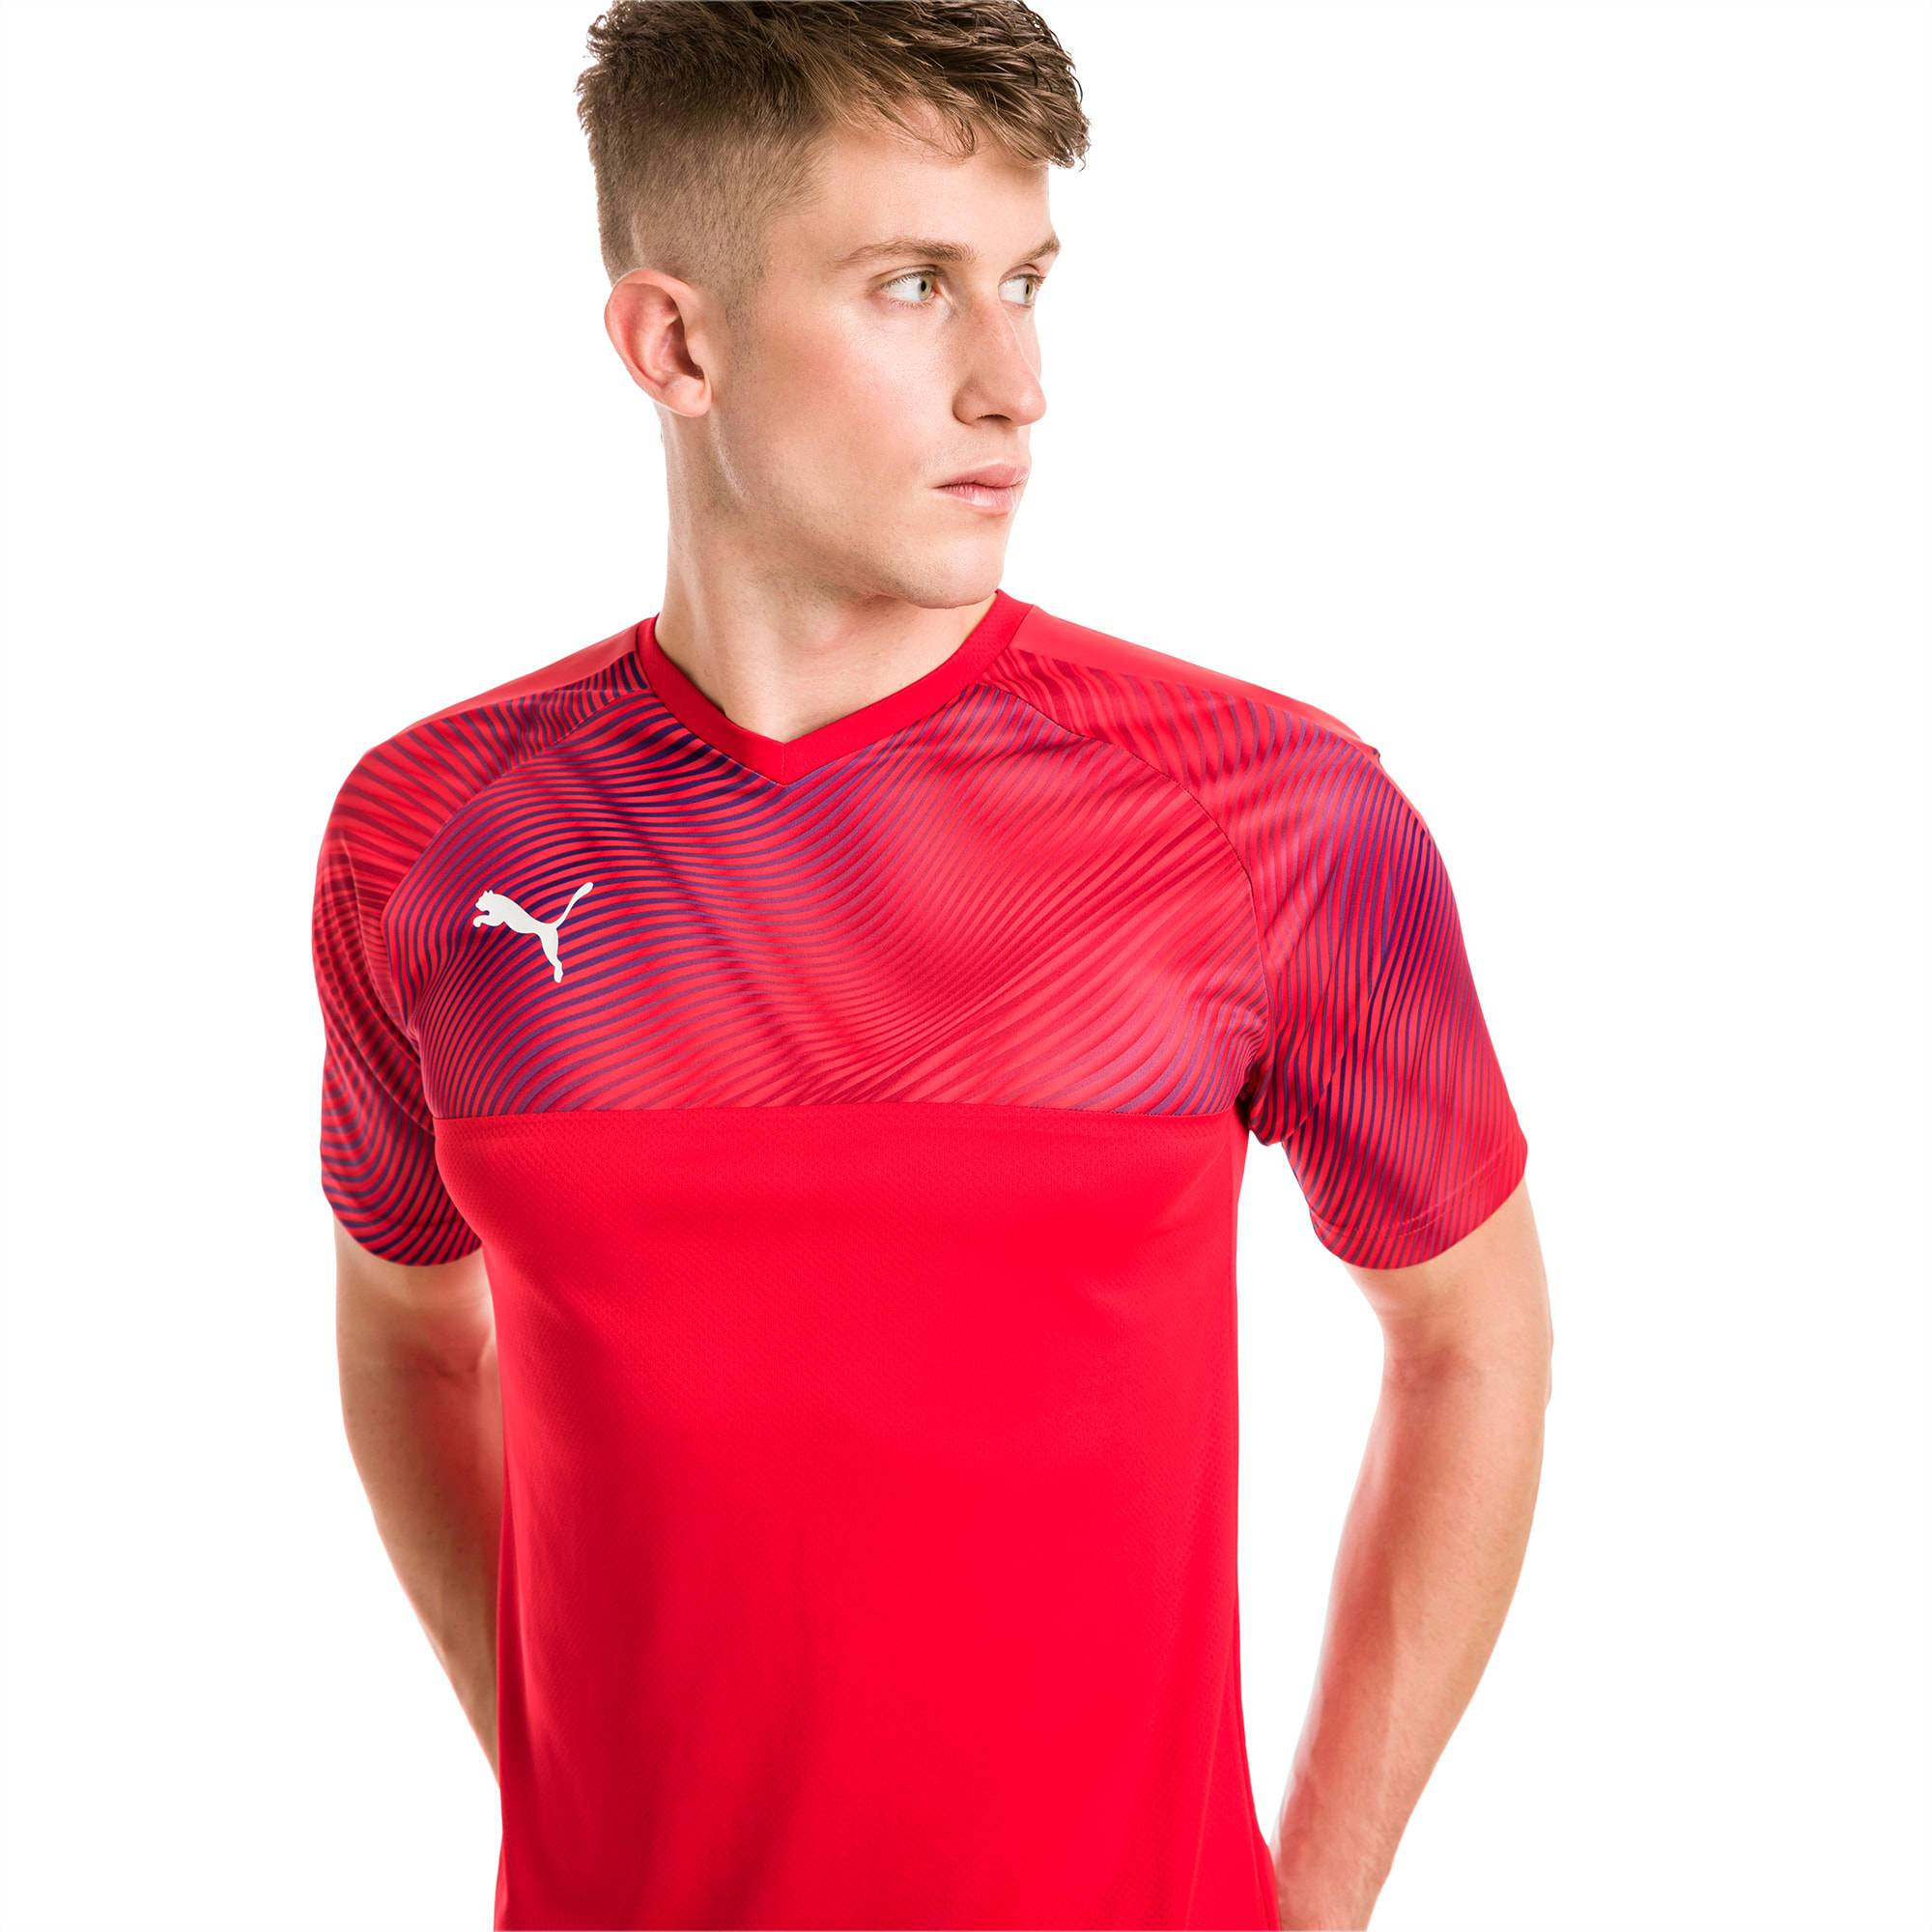 PUMA Maillot Football CUP pour Homme, Rouge/Blanc, Taille 5XL, Vêtements